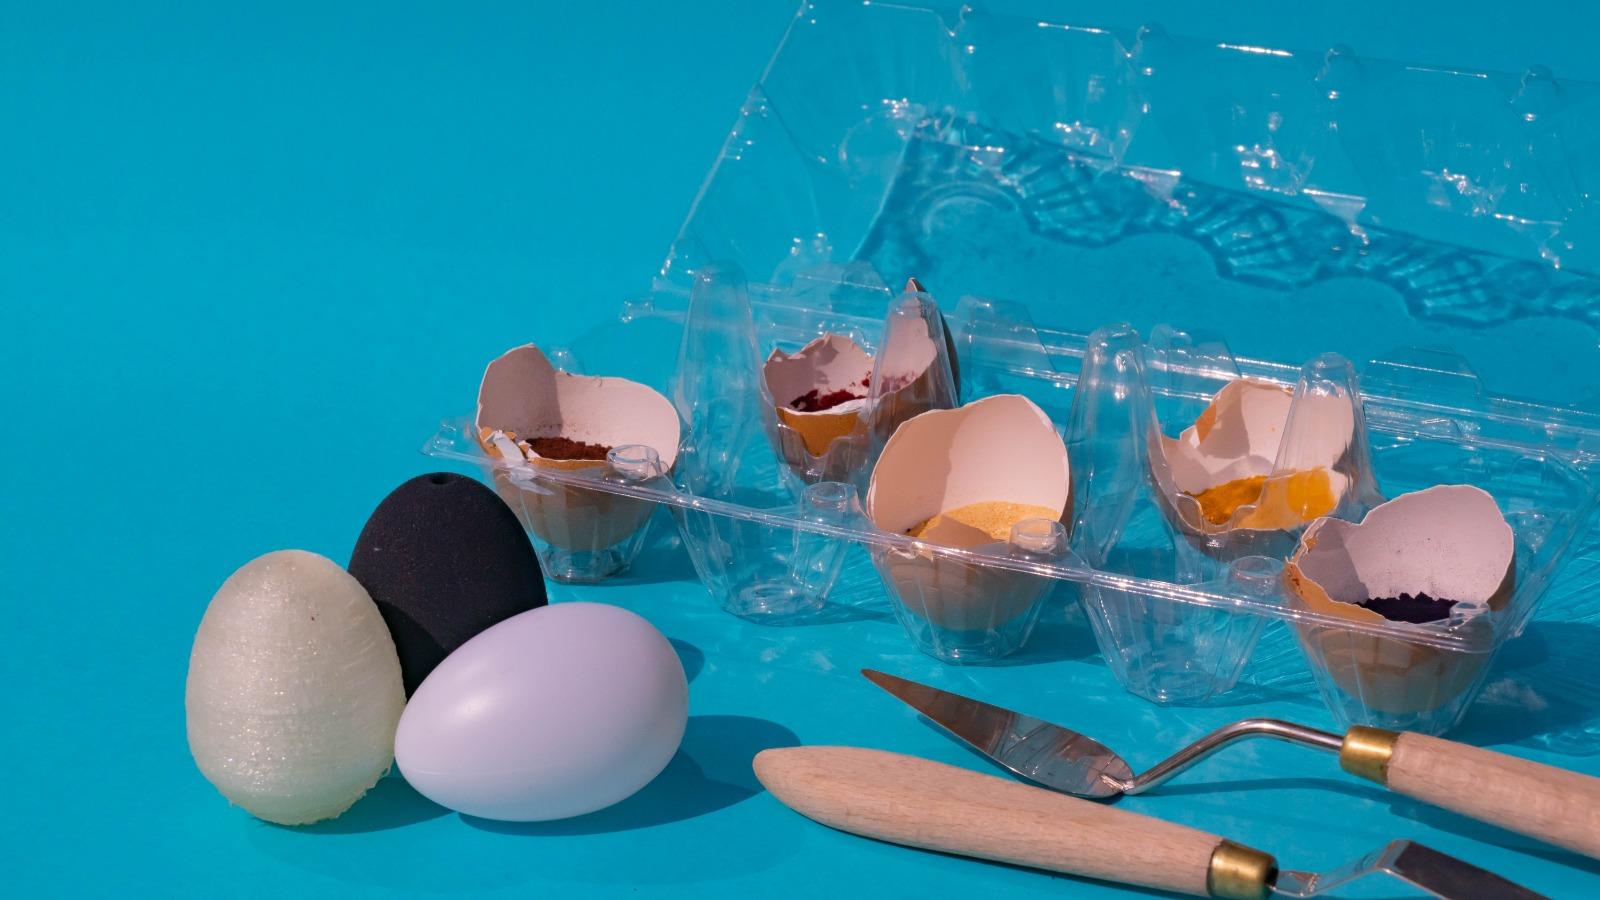 Eggs paint making kit